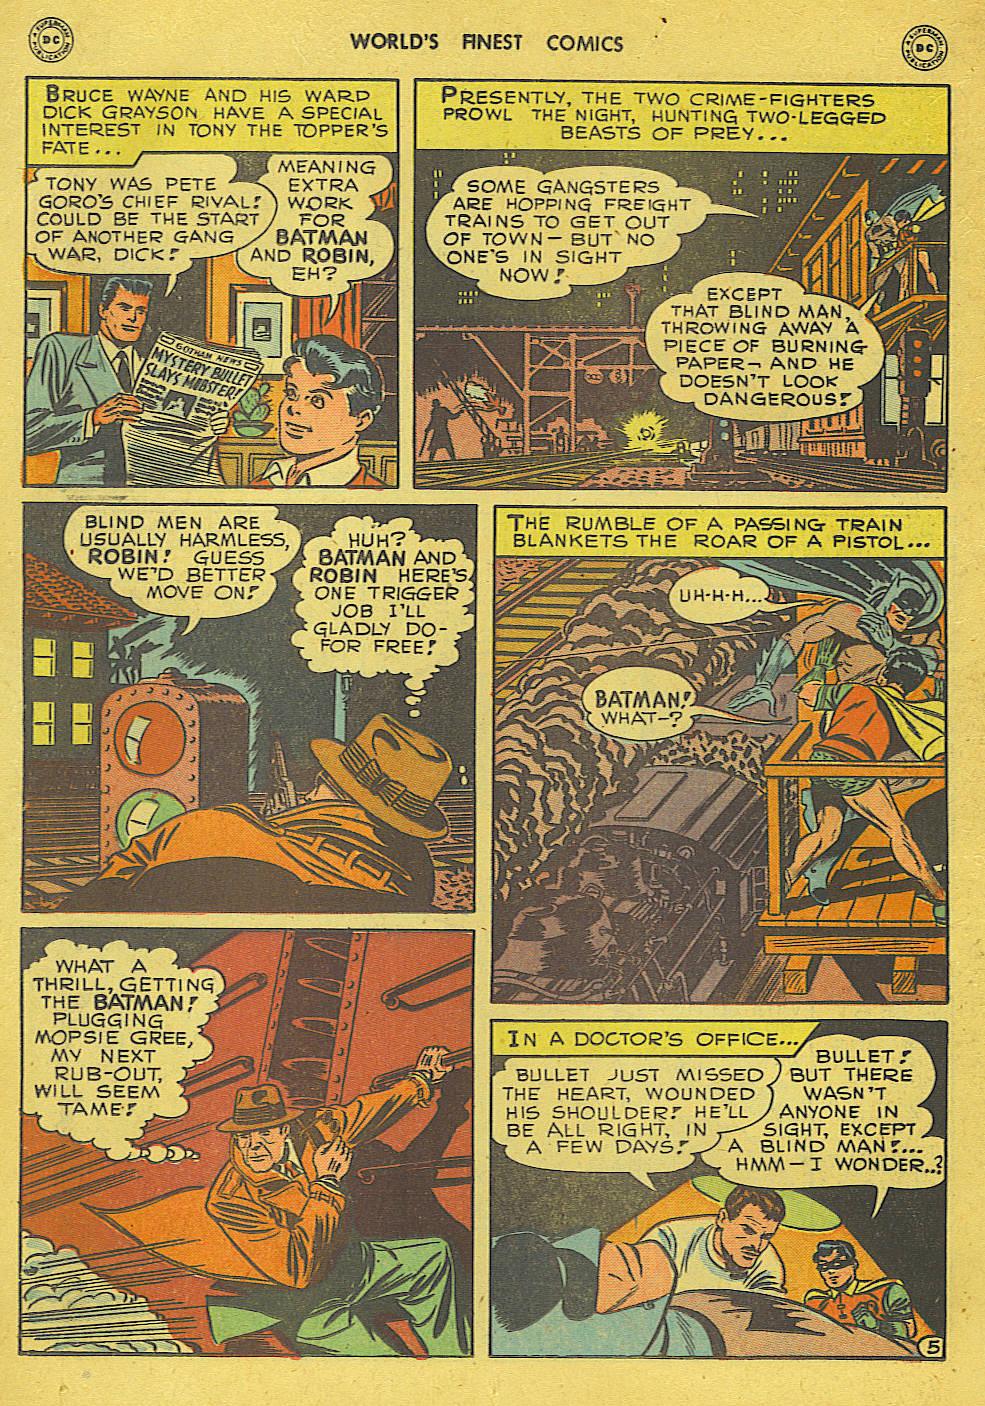 Read online World's Finest Comics comic -  Issue #34 - 66